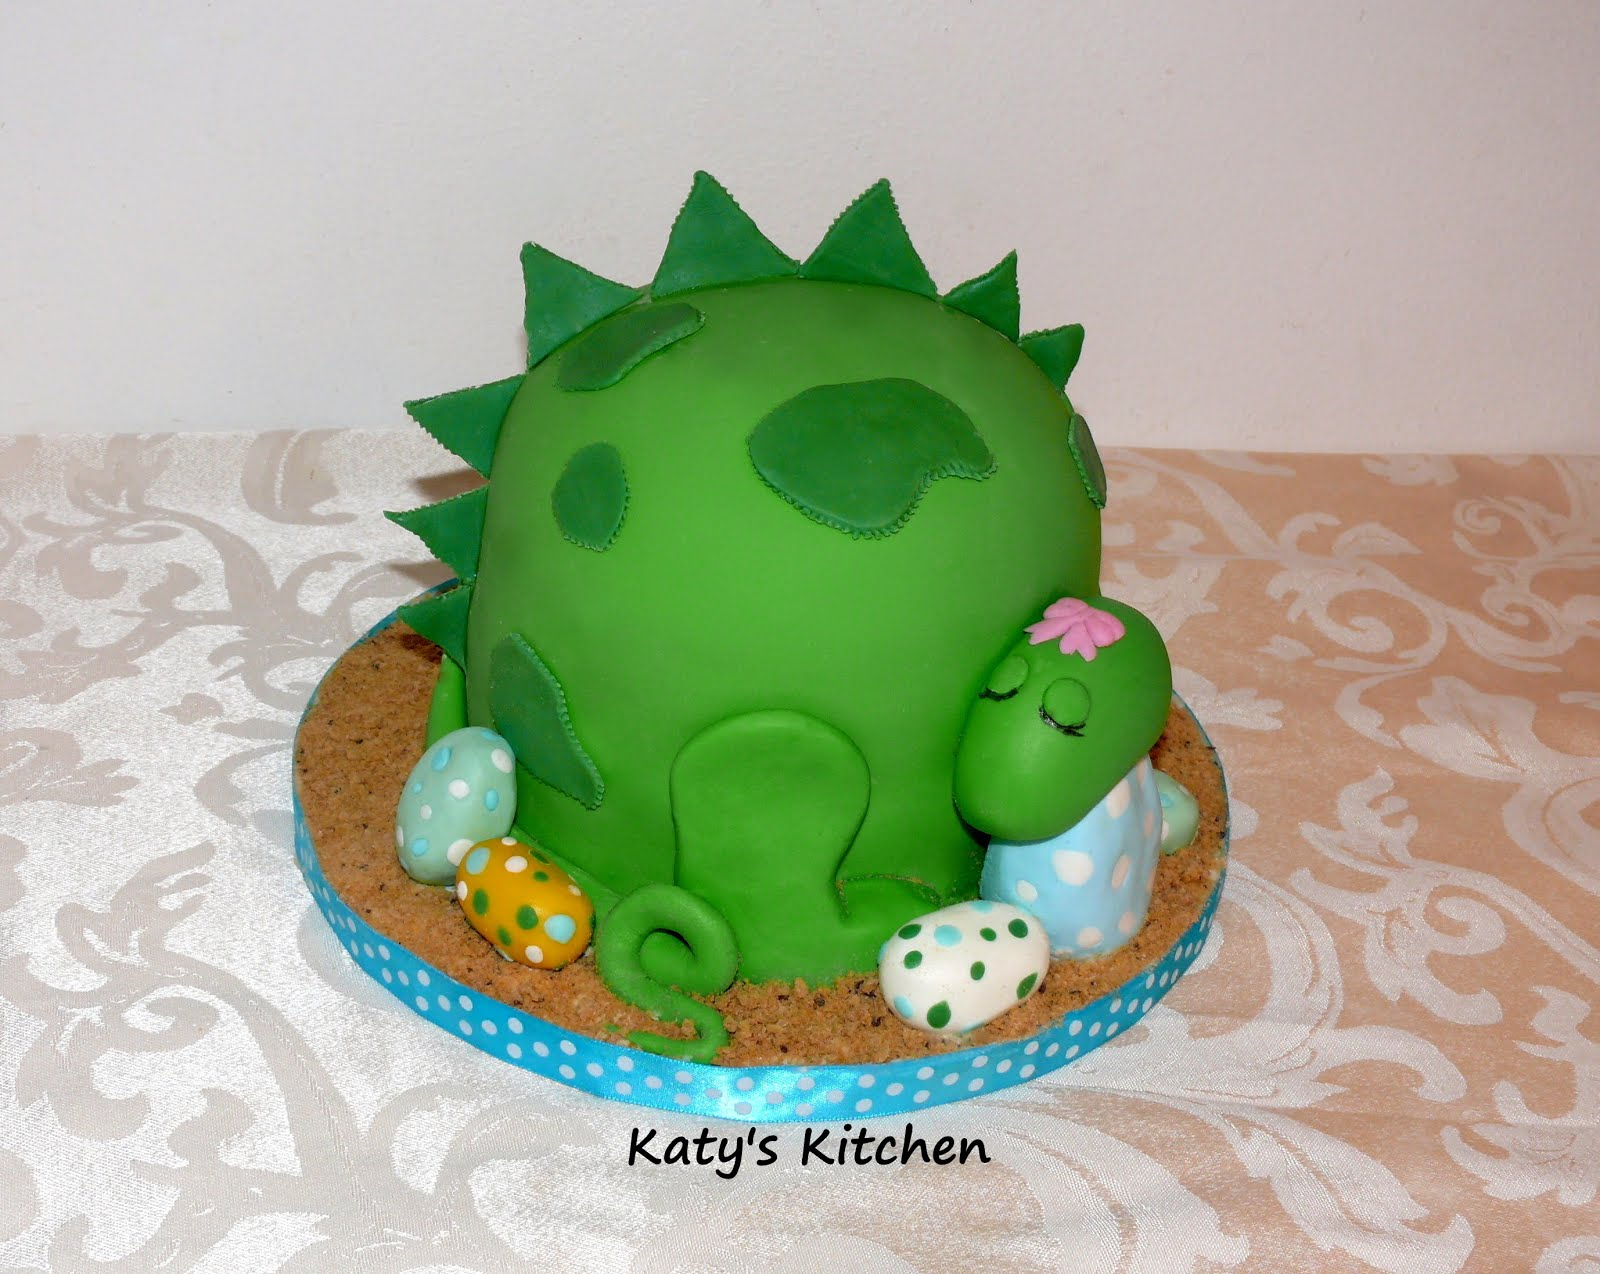 Katys Kitchen Dinosaur Baby Shower Cake And Cupcakes